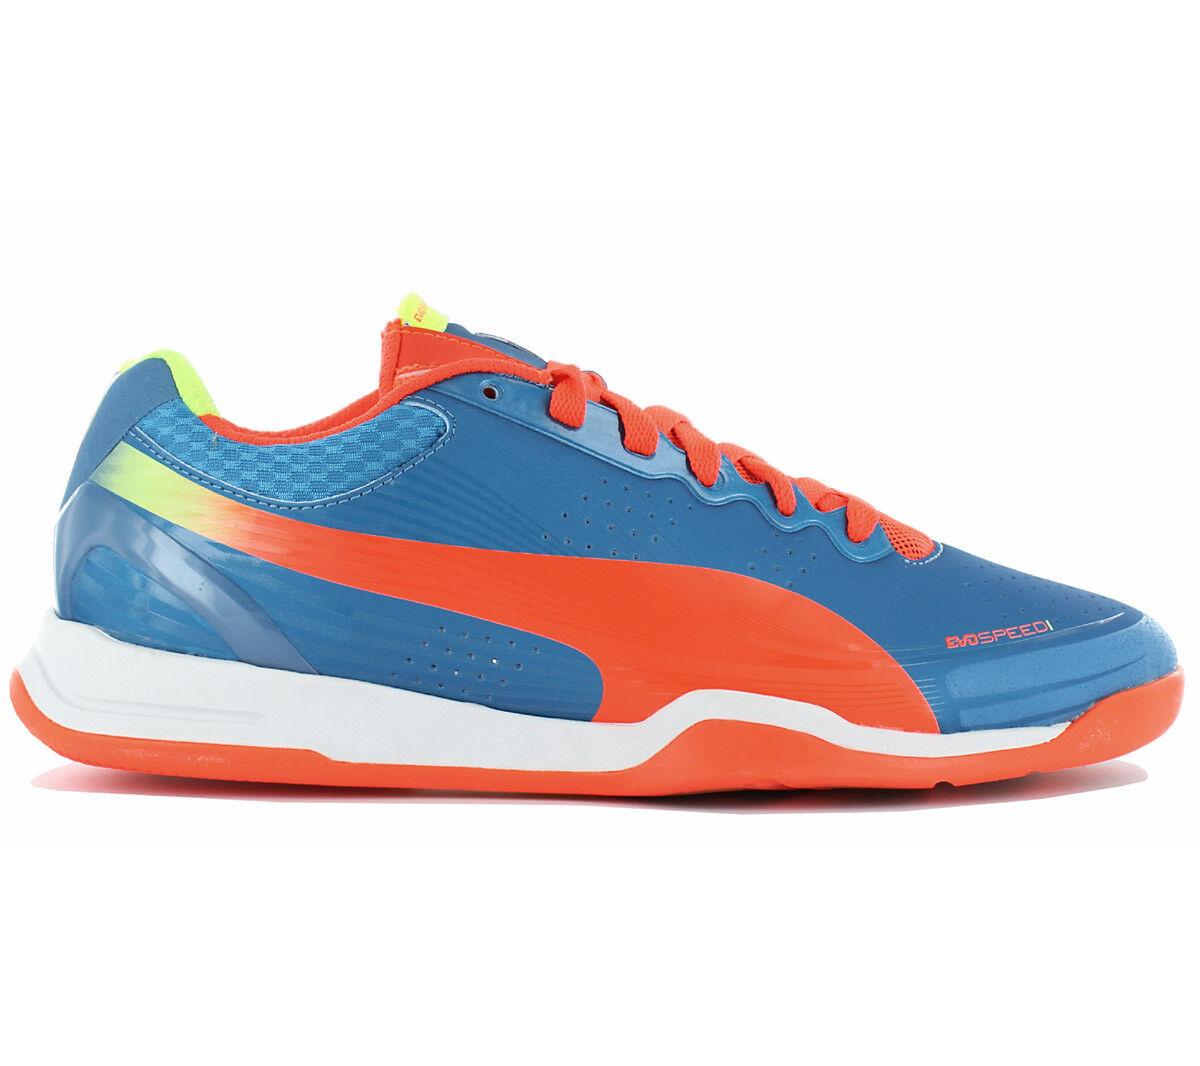 Puma Evospeed Indoor 1.2 Men's Indoor Shoes Handball Volleyball Badminton Shoes